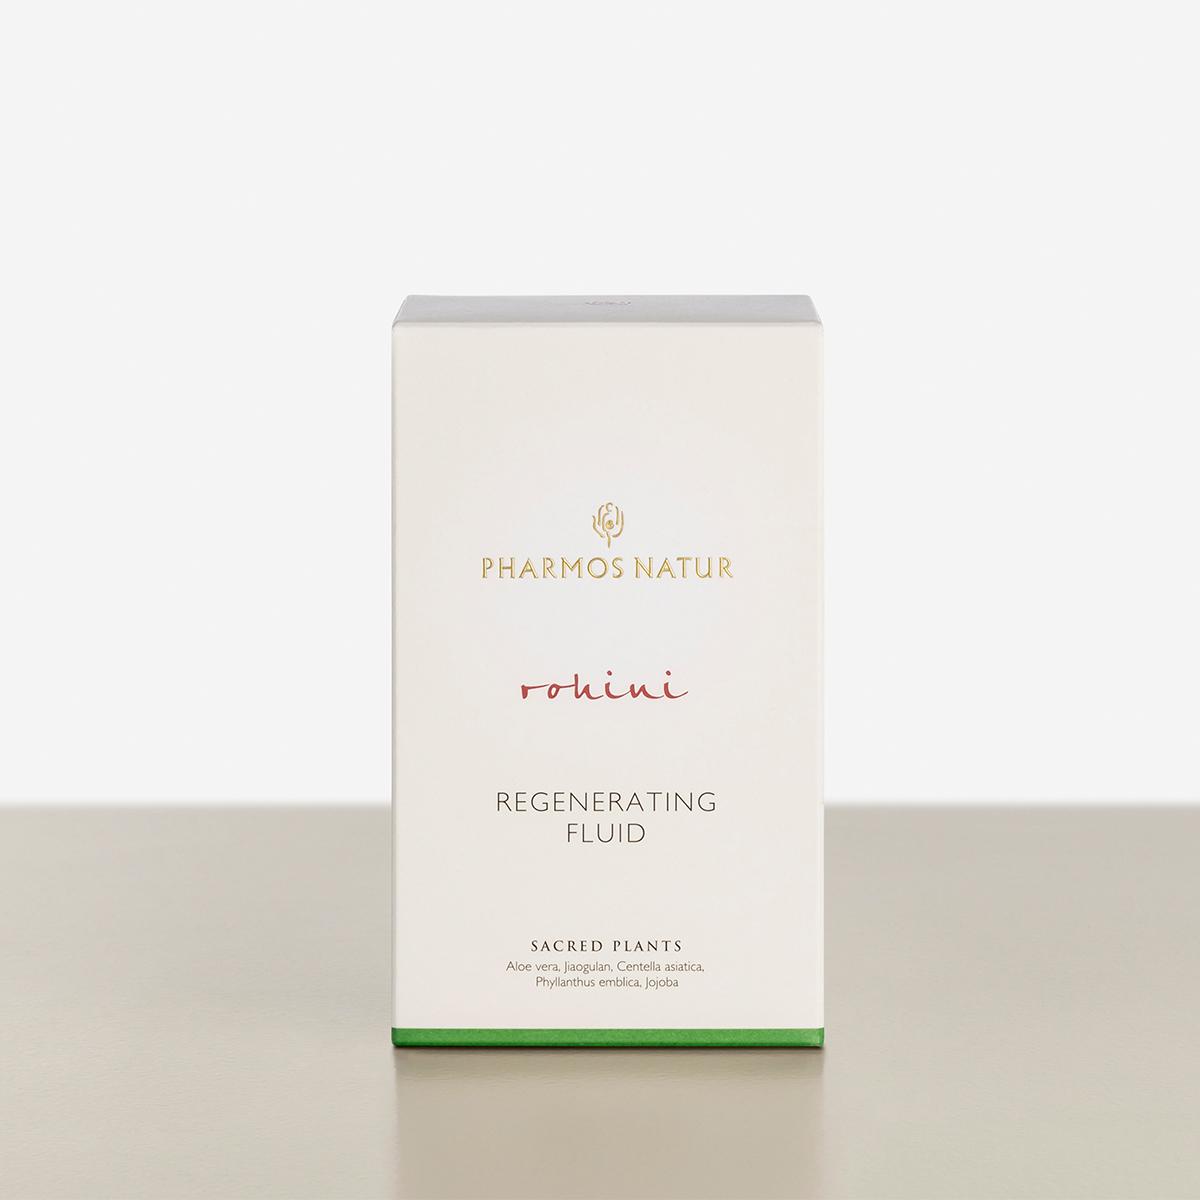 Verpackung Regenerating Fluid Rohini Produktbild